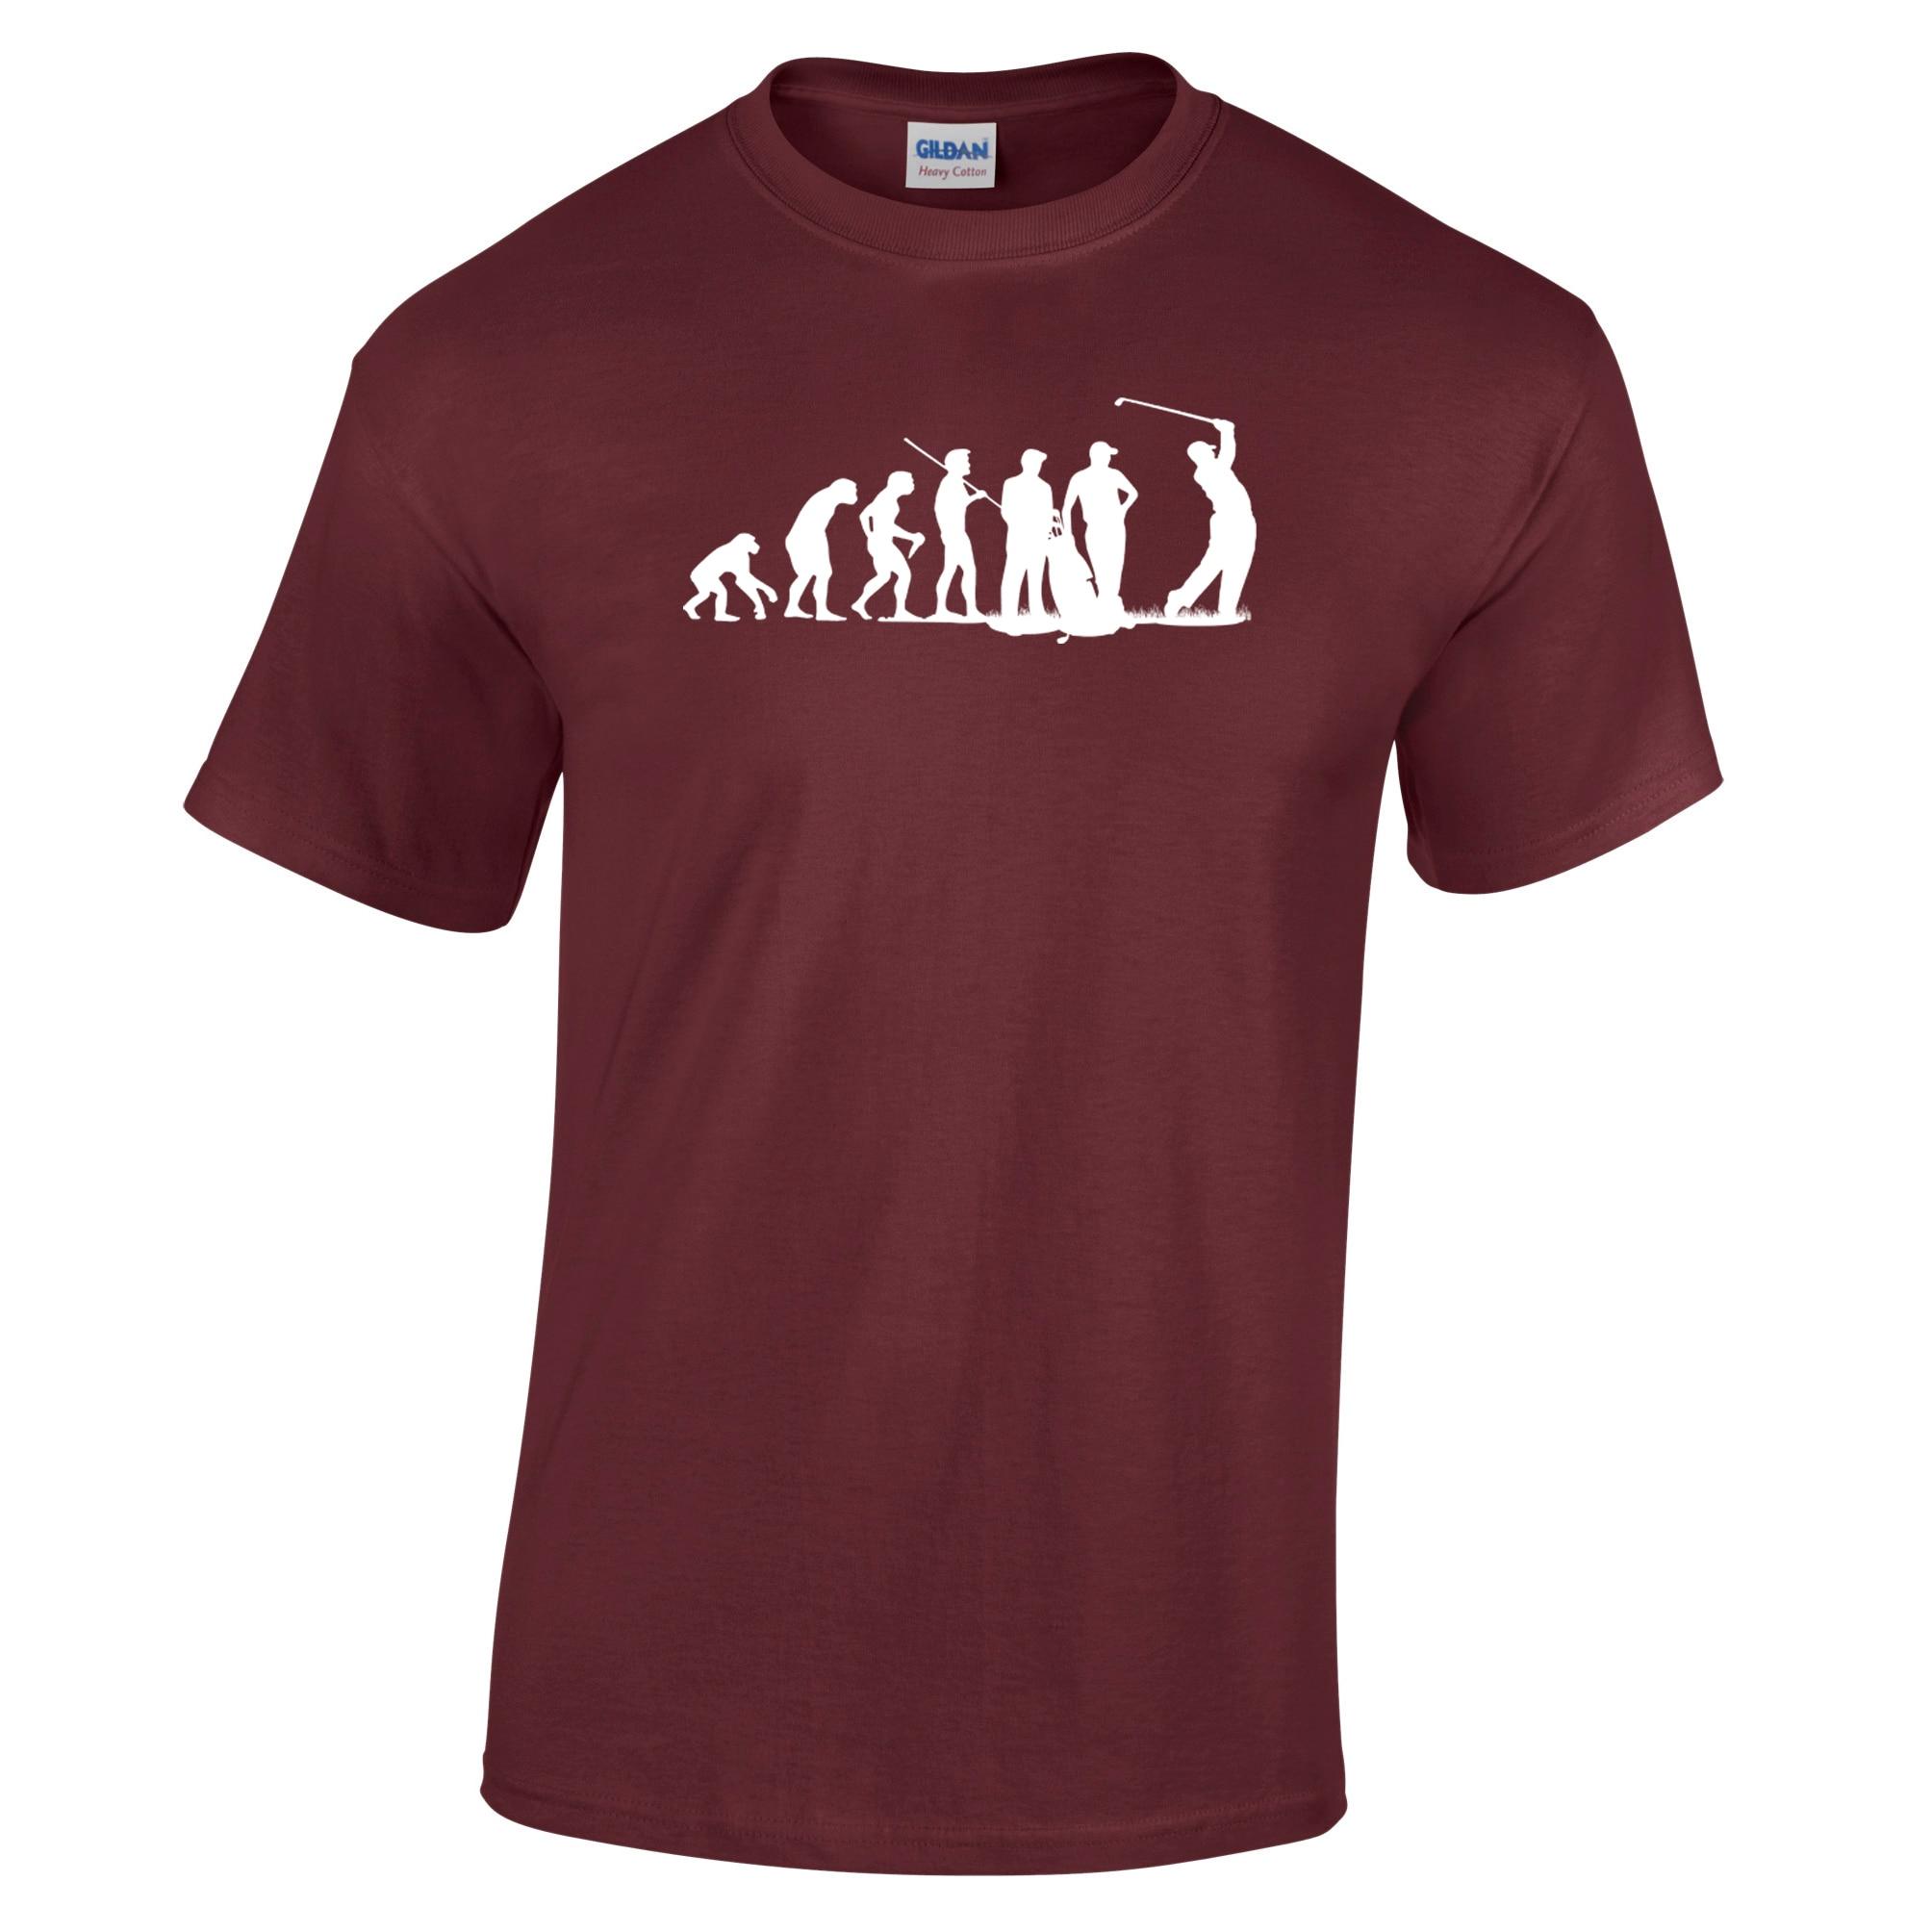 Evolution of a Golfer T Shirt Golfing Gift Funny Golfing Range[Apparel]